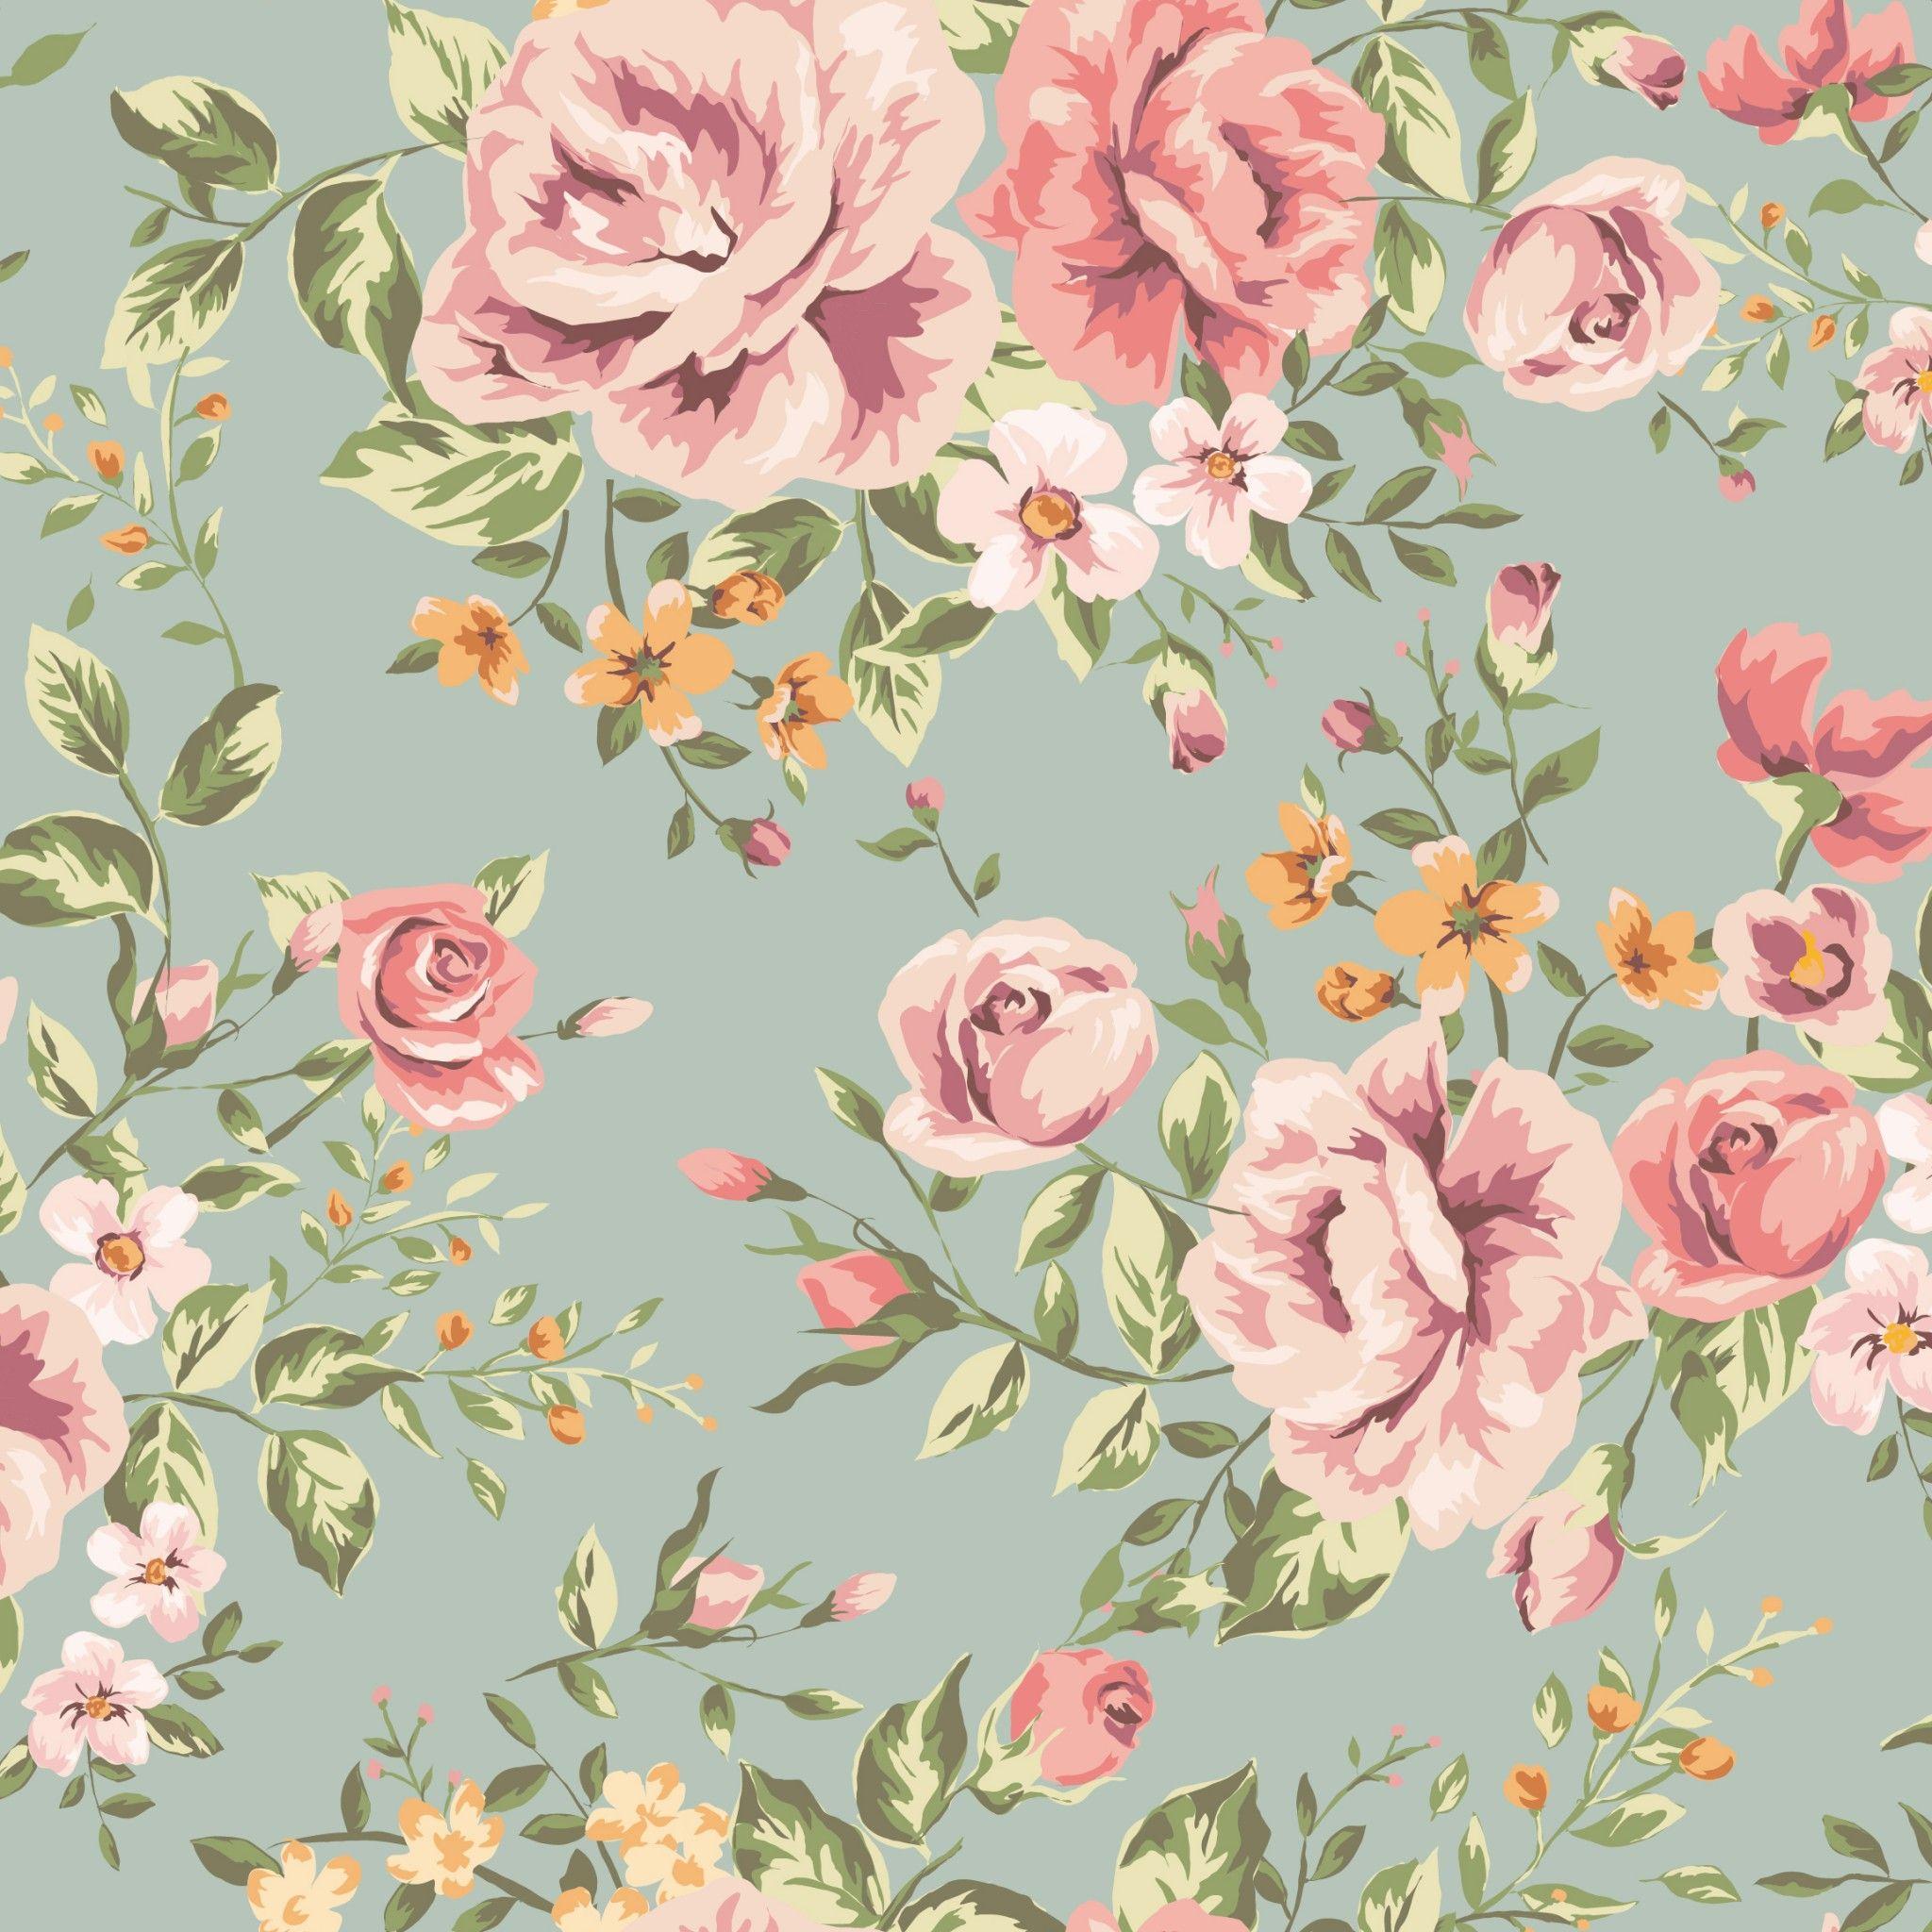 Classic Seamless Vintage Flower Pattern Vintage Floral Pattern Wallpaper Floral Wallpaper Floral Pattern Wallpaper